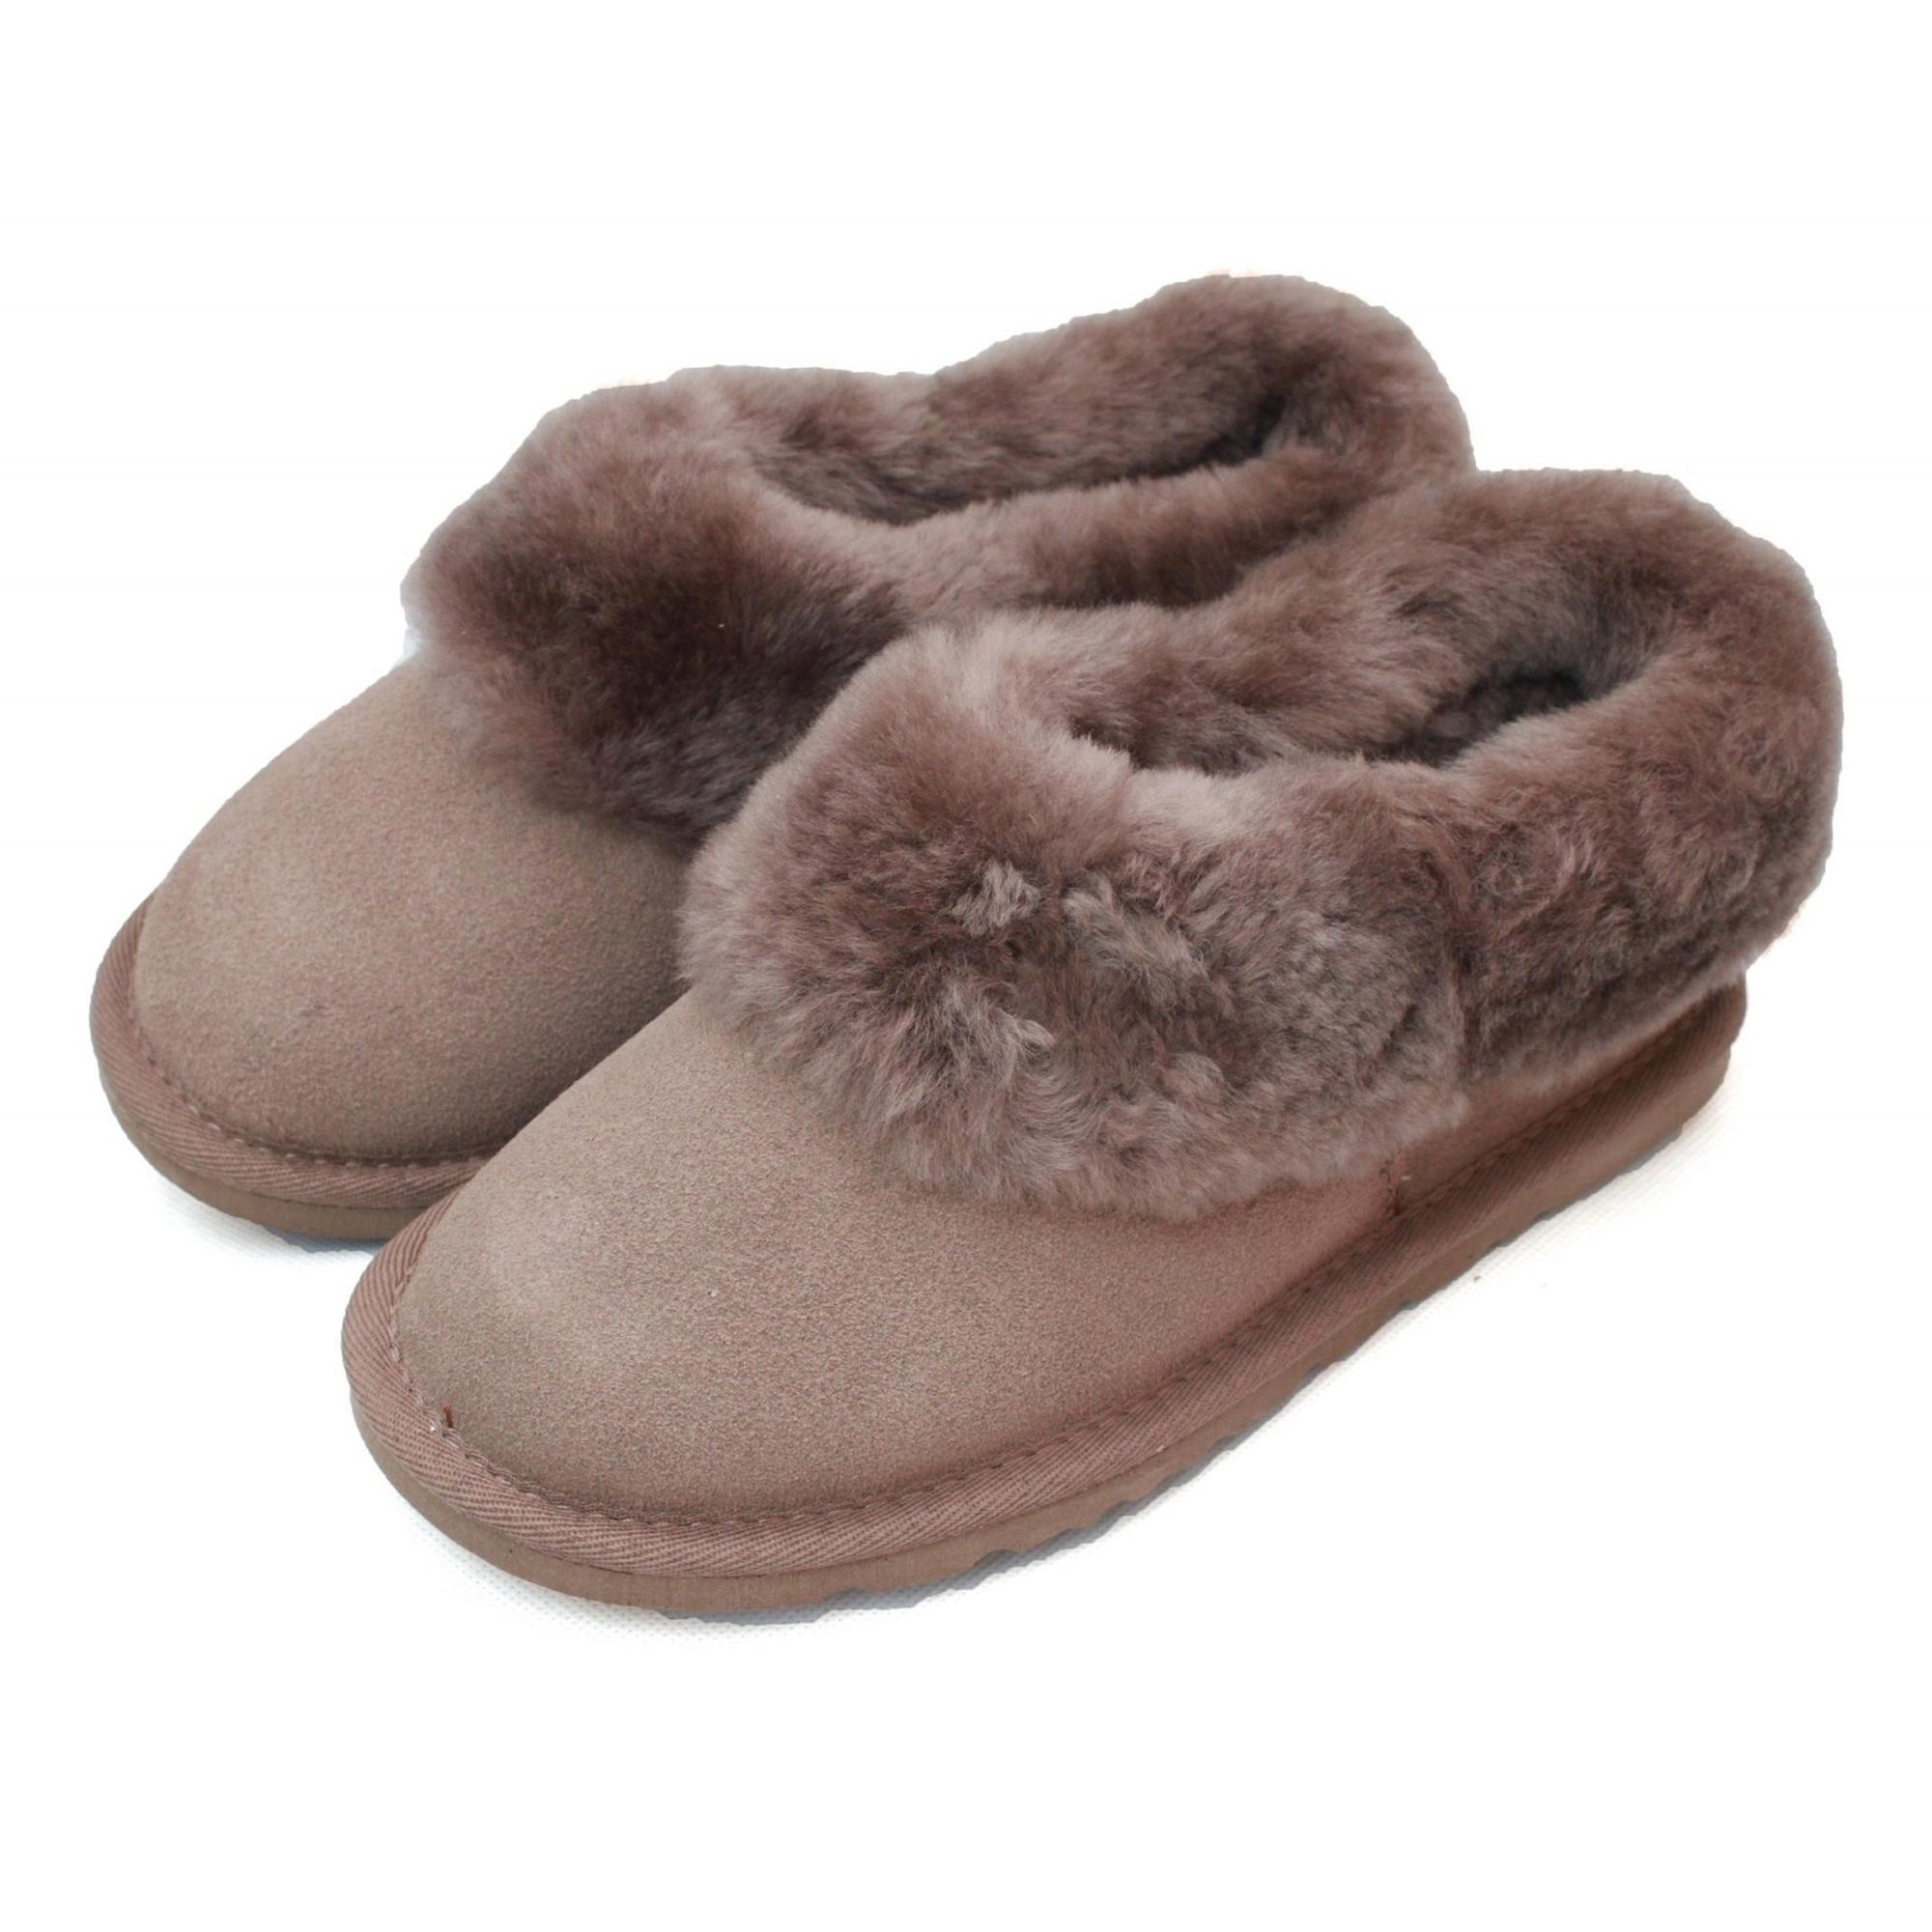 Eastern-Counties-Leather-Womens-Ladies-Sheepskin-Lined-Slipper-Boots-EL156 miniatura 5